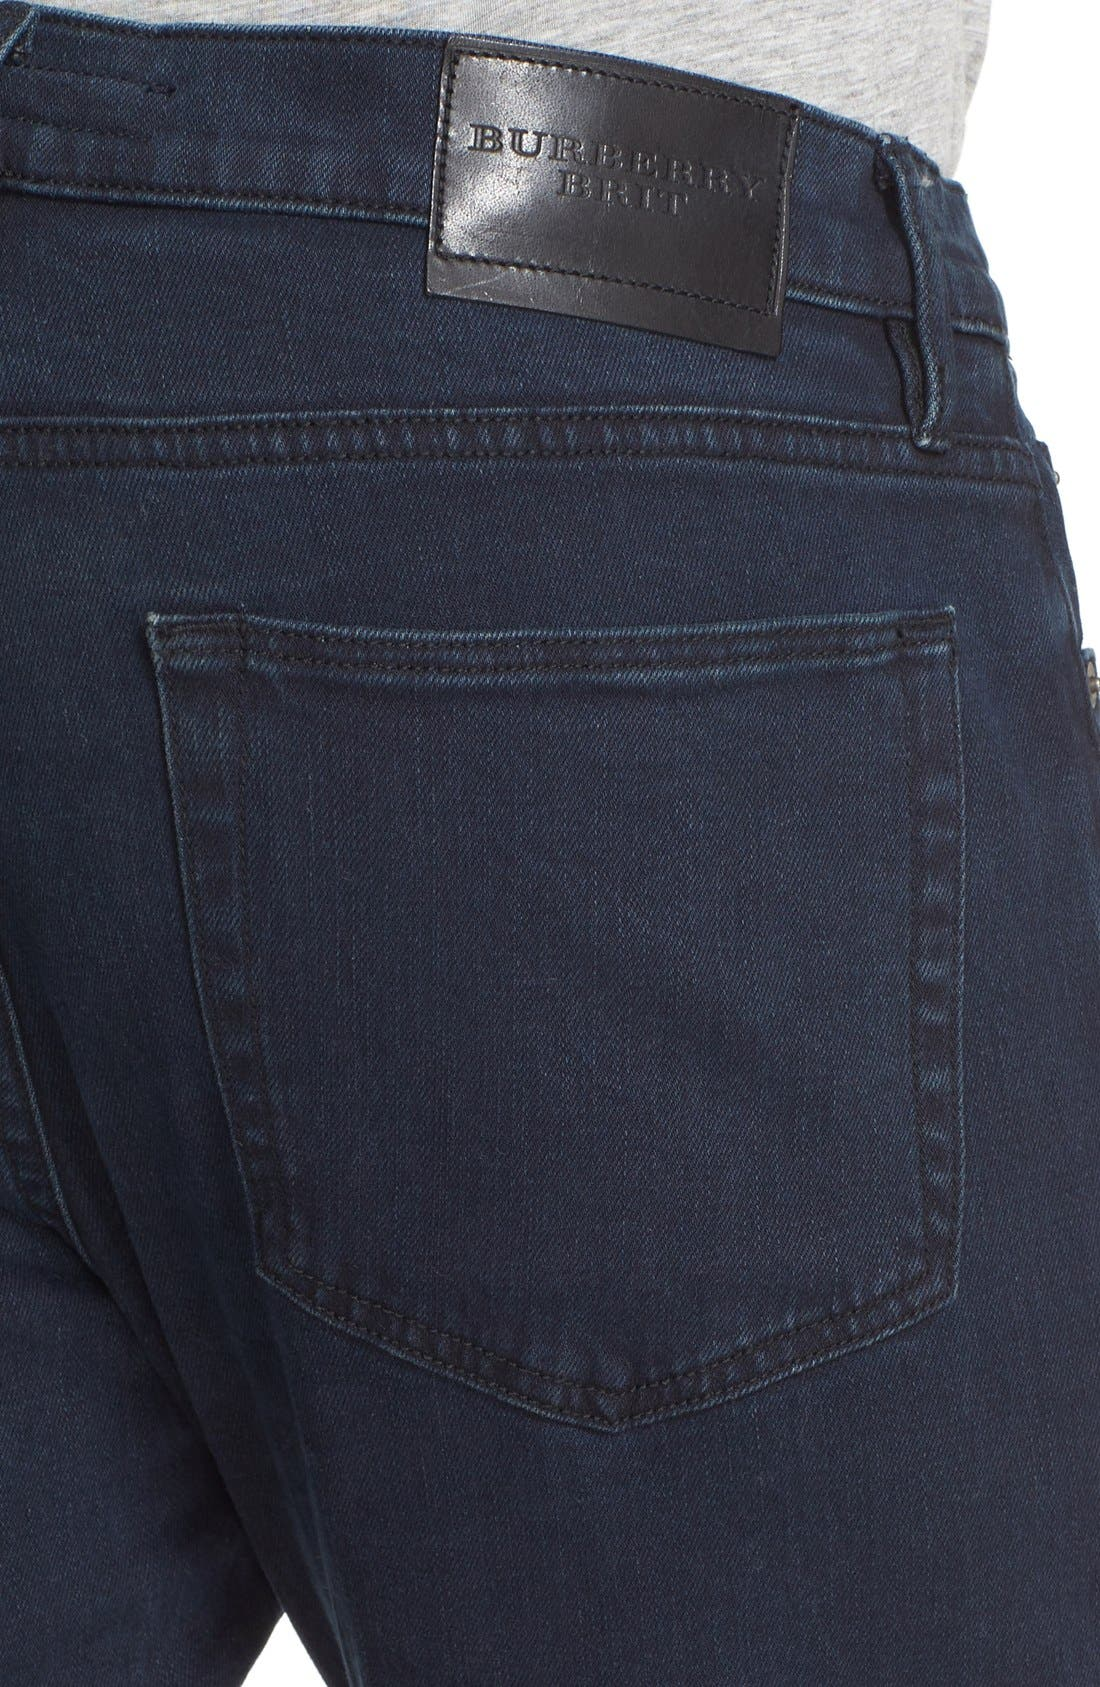 Straight Leg Jeans Jeans,                             Alternate thumbnail 4, color,